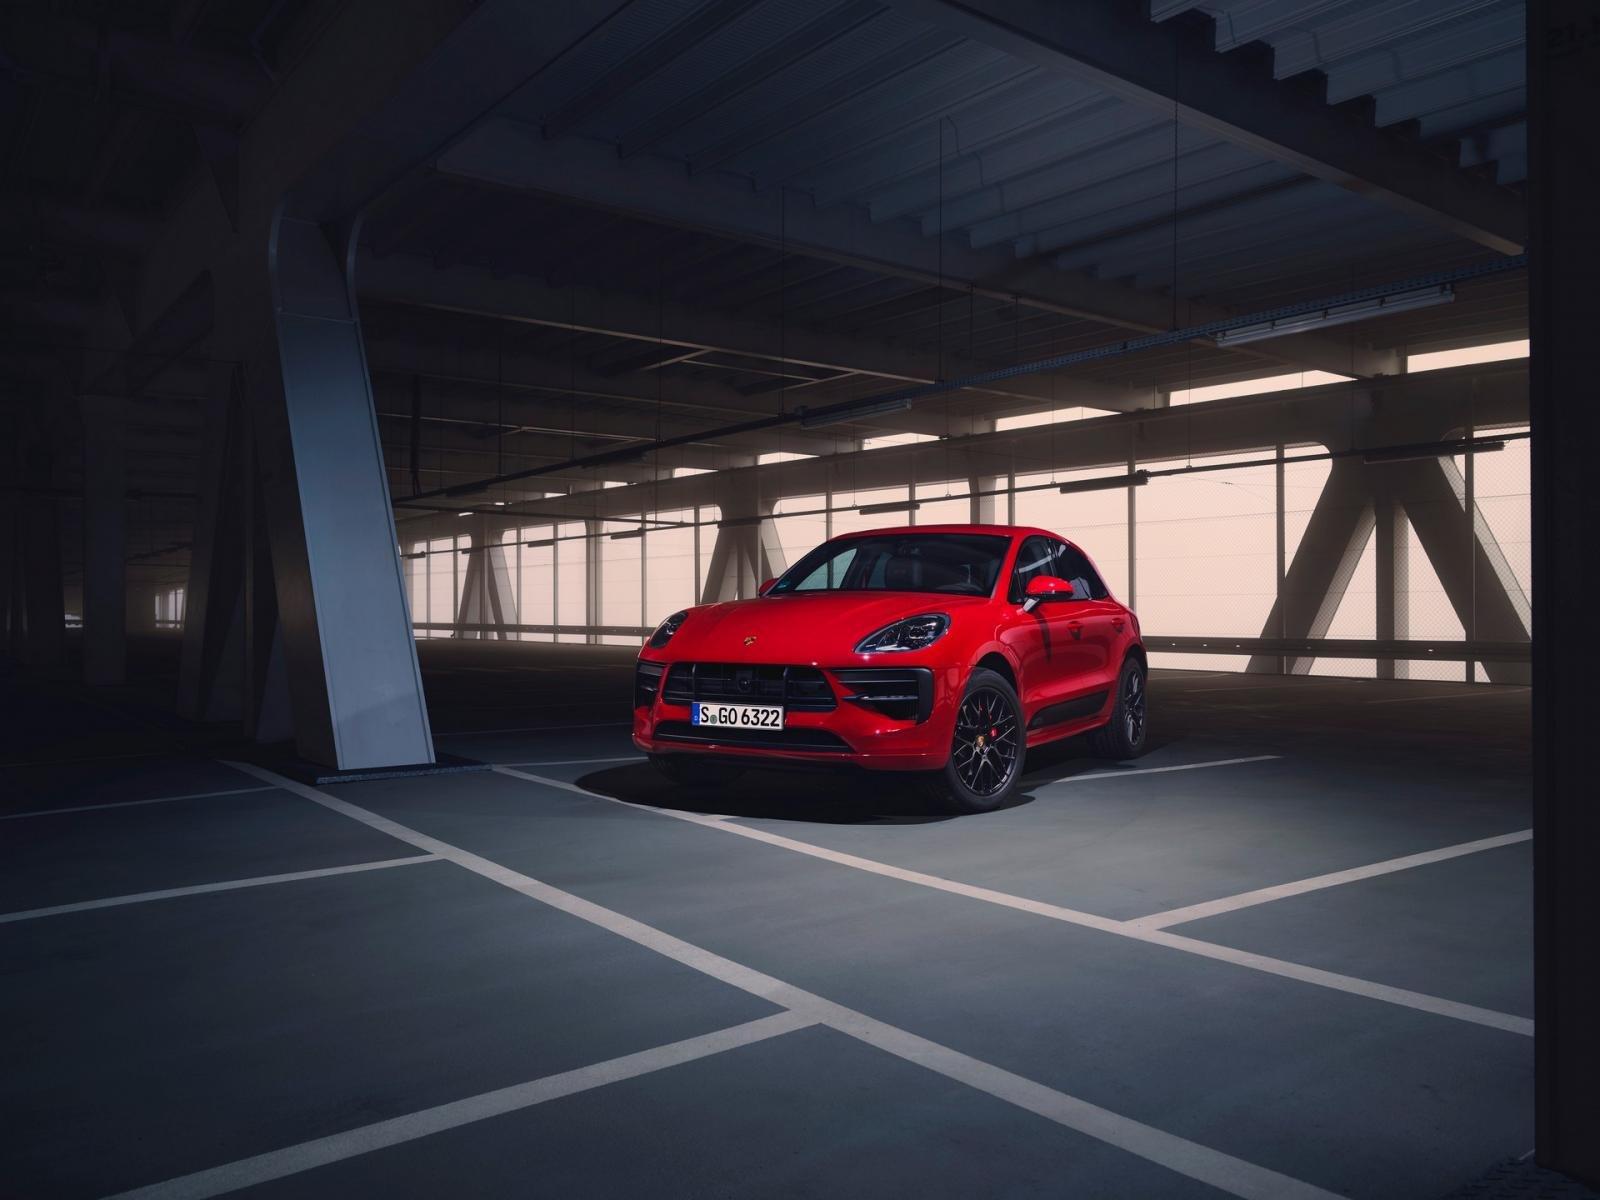 Porsche Macan GTS 2020: góc 3/4 đầu xe